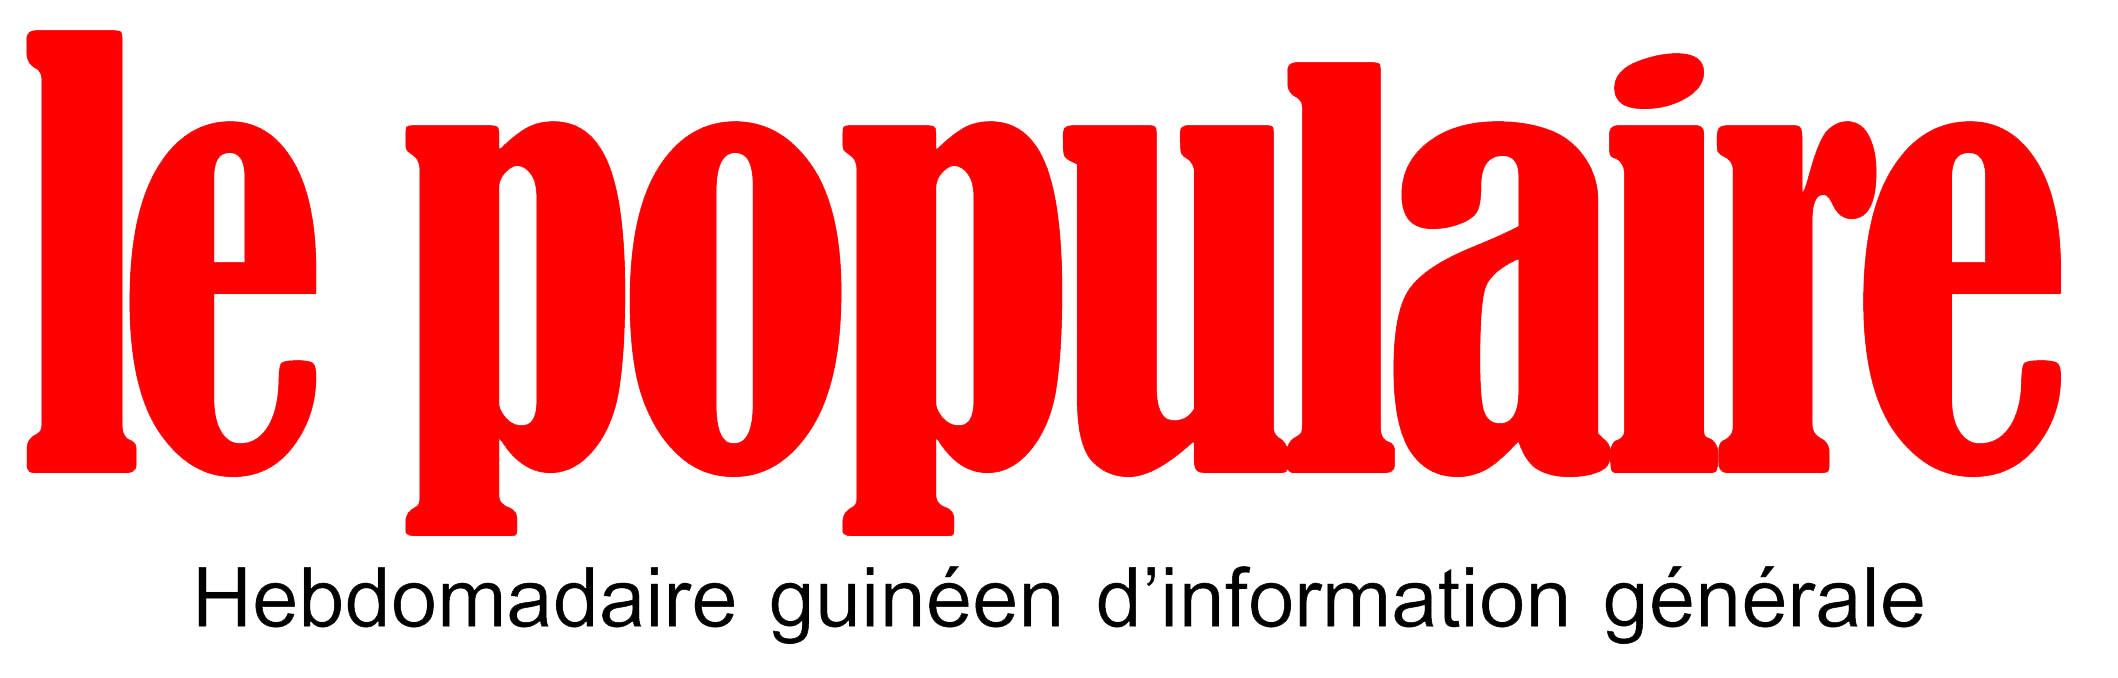 lepopulaireguinee